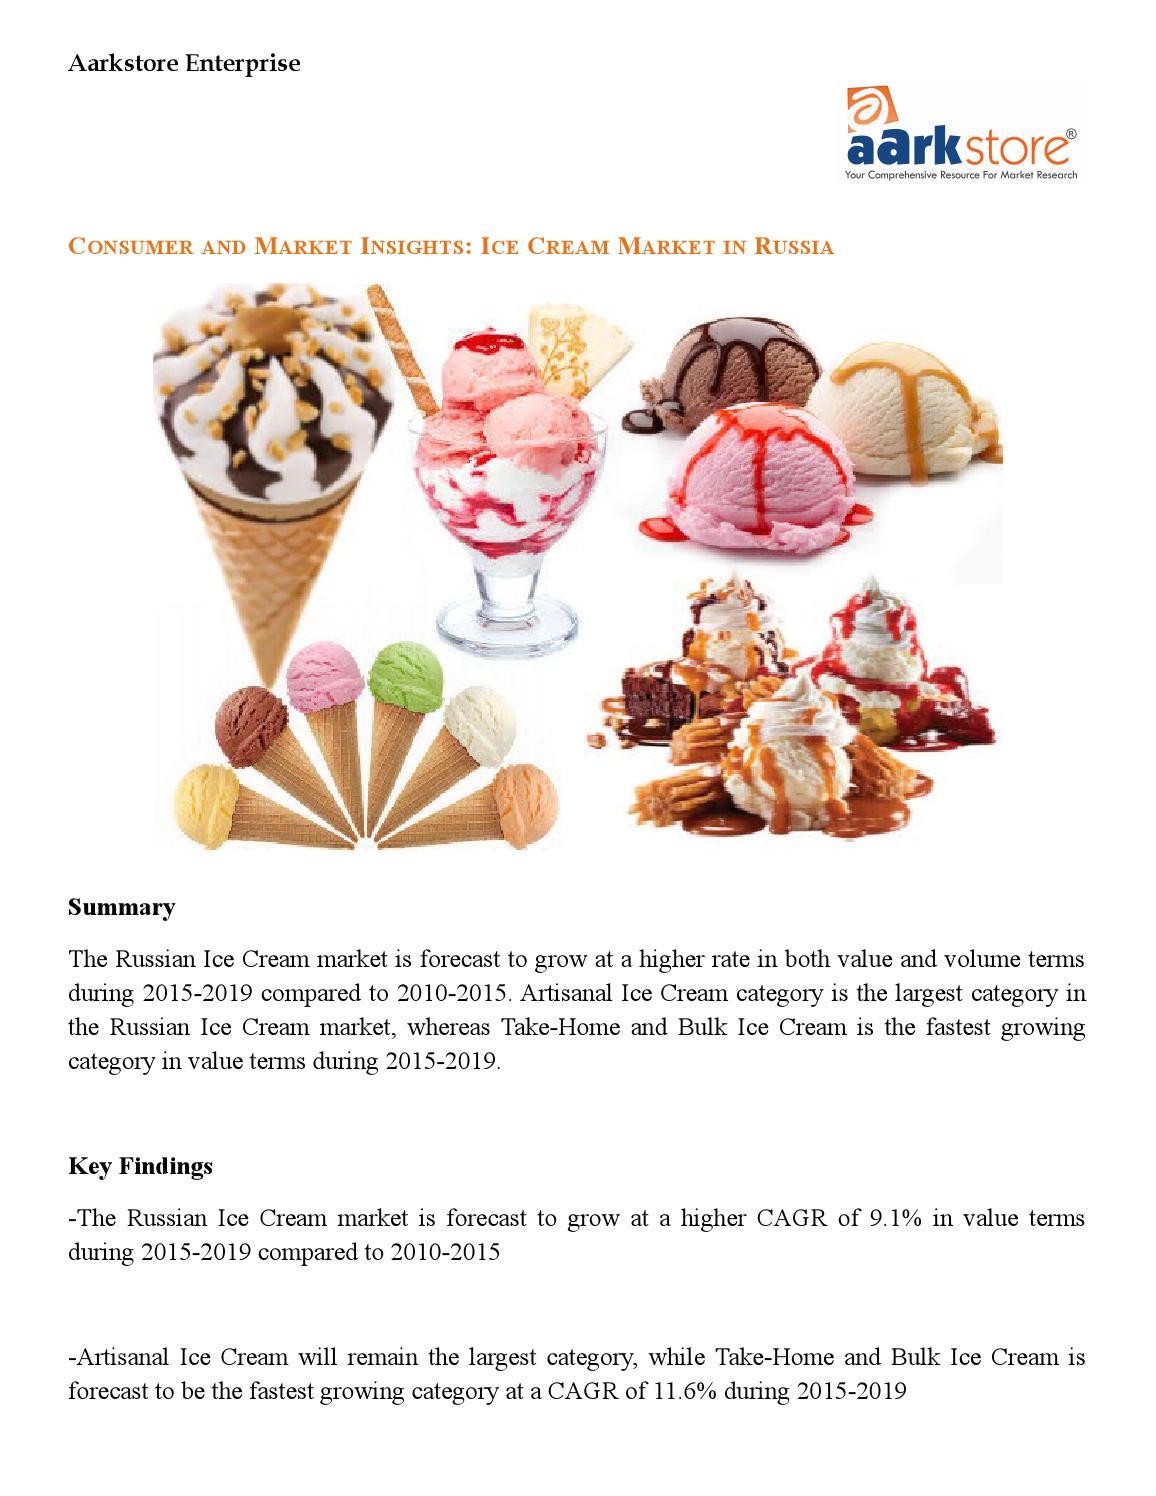 Ice Cream Market in Russia: AarkstoreEnterprise by Aarkstore ...